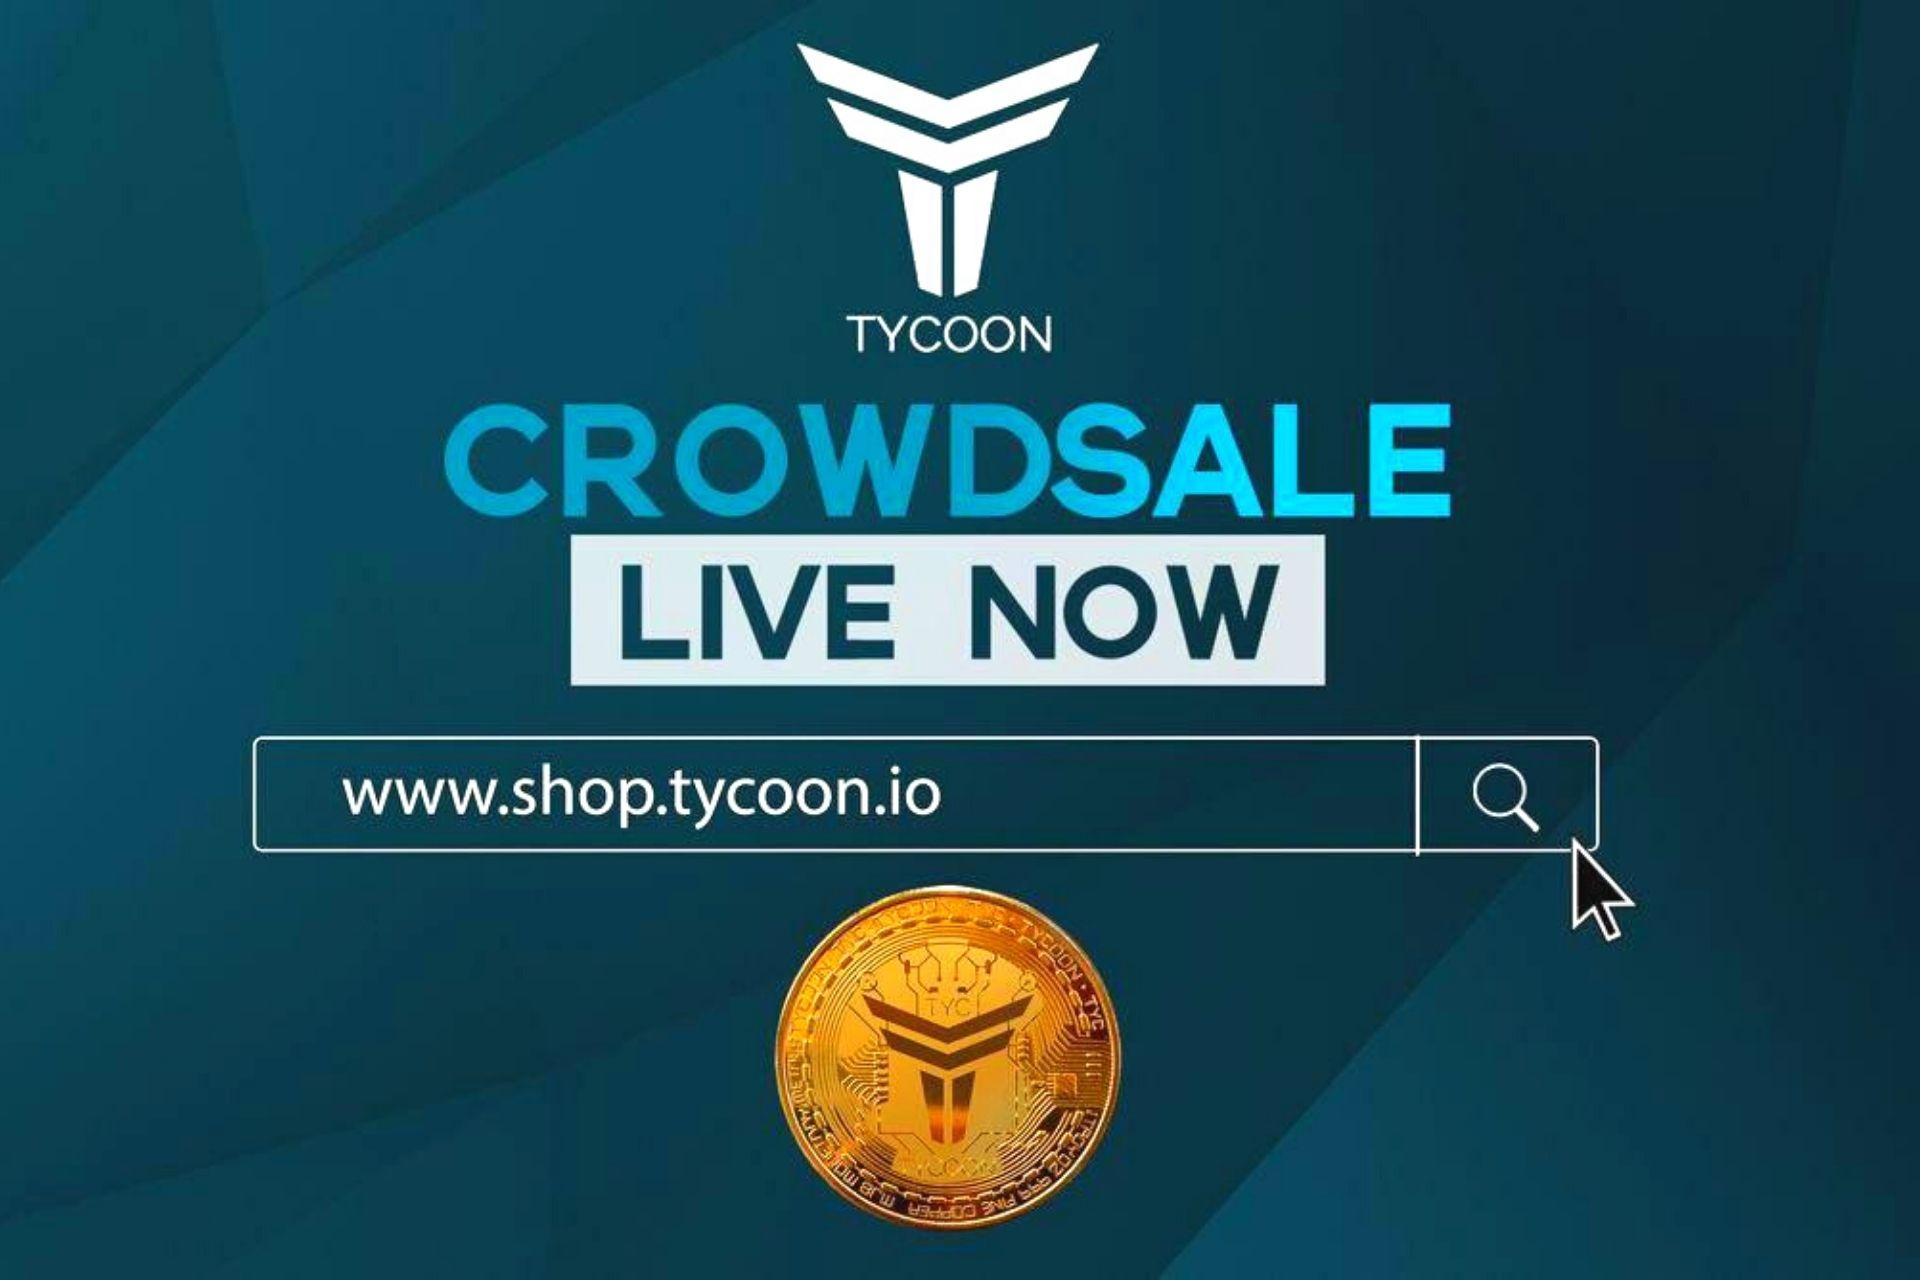 Crowdsale Is Live Now: Tycoon Unveils Token Online Shop